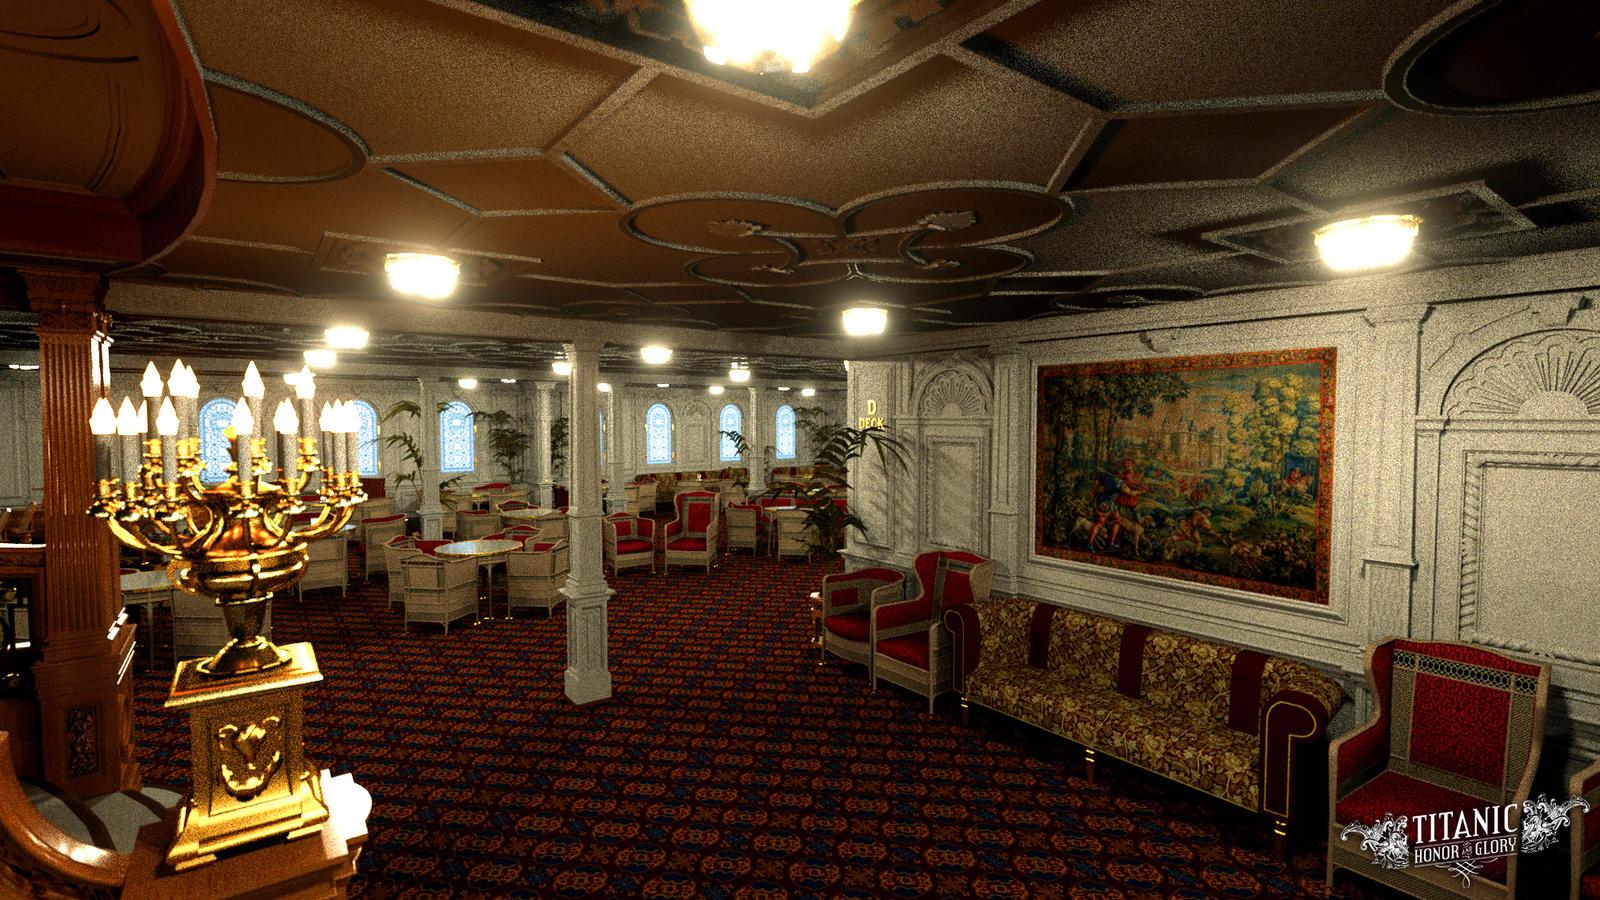 Exceptional ... TitanicHonorAndGlory Titanicu0027s First Class Reception Room   2 By  TitanicHonorAndGlory Part 29